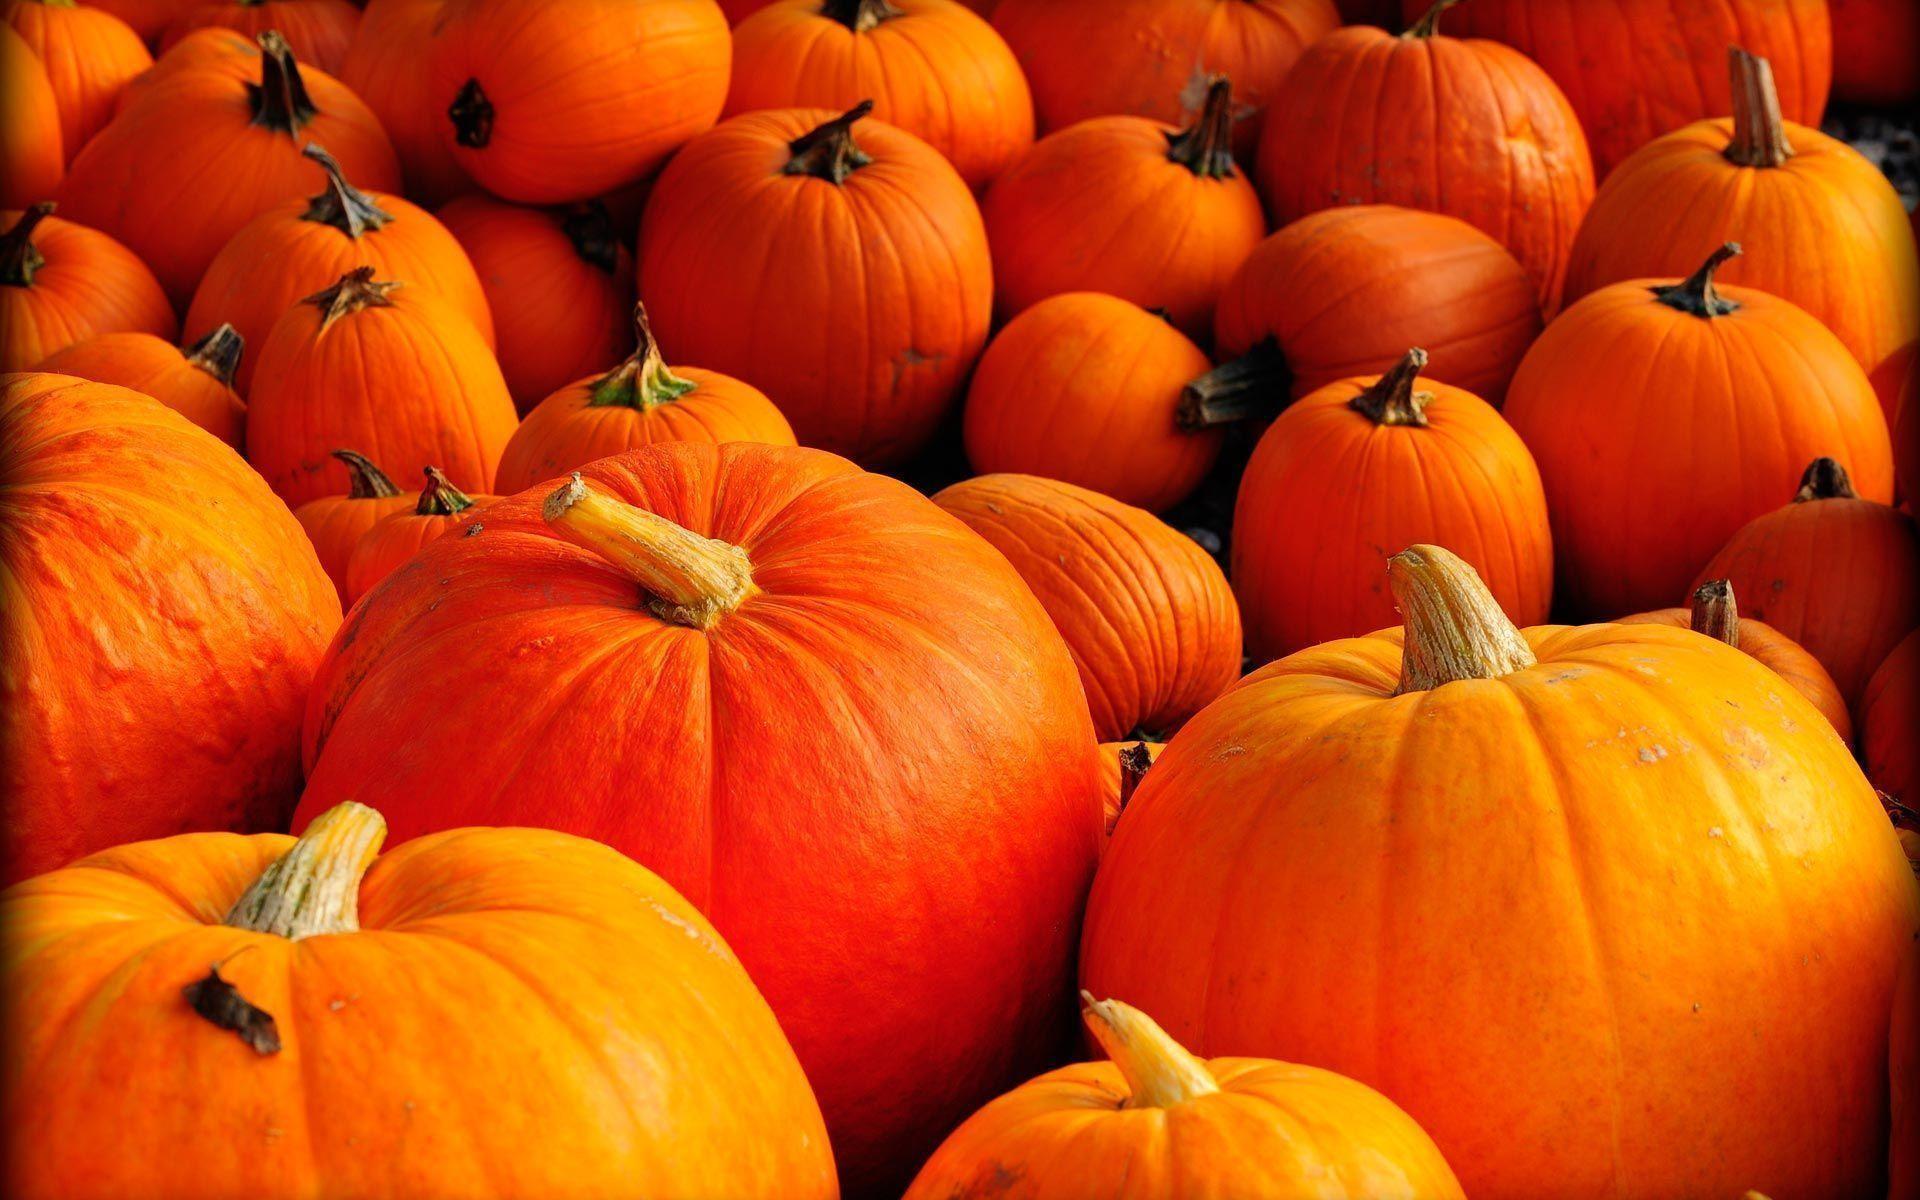 Pumpkins Wallpapers – Full HD wallpaper search